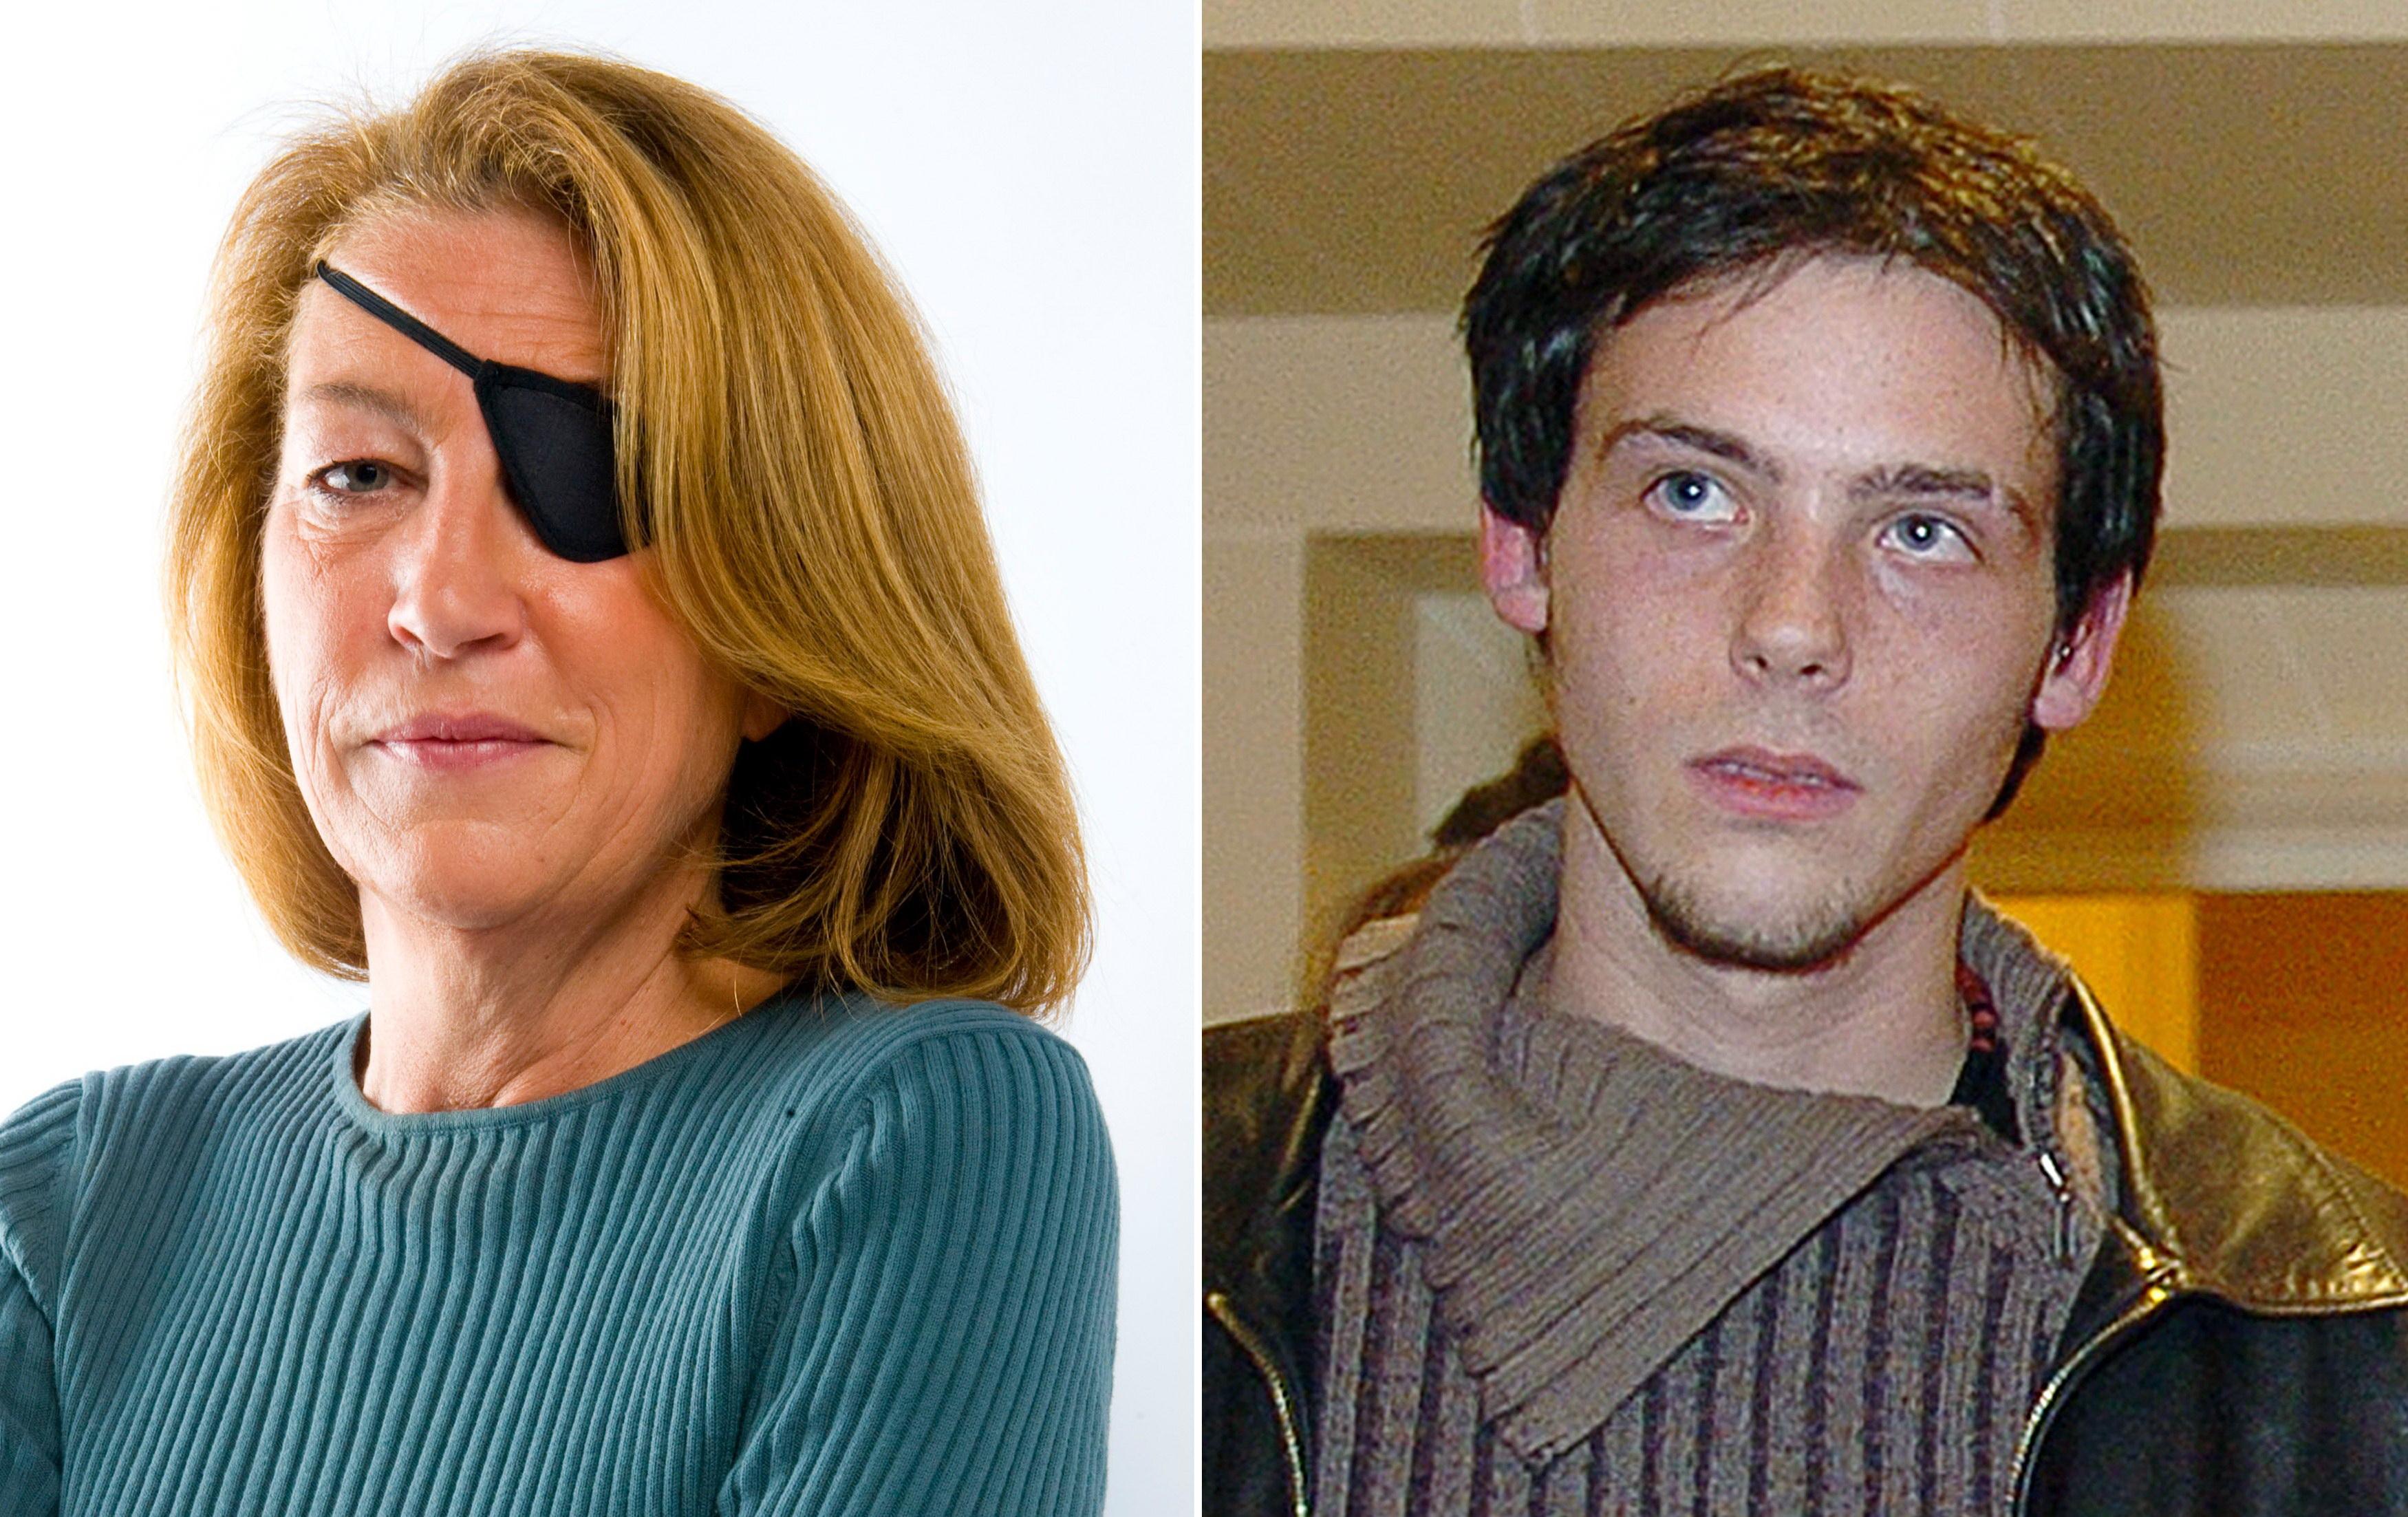 Si-a pierdut intai un ochi pentru meserie, iar apoi viata. Cine sunt cei 2 jurnalisti ucisi in Siria